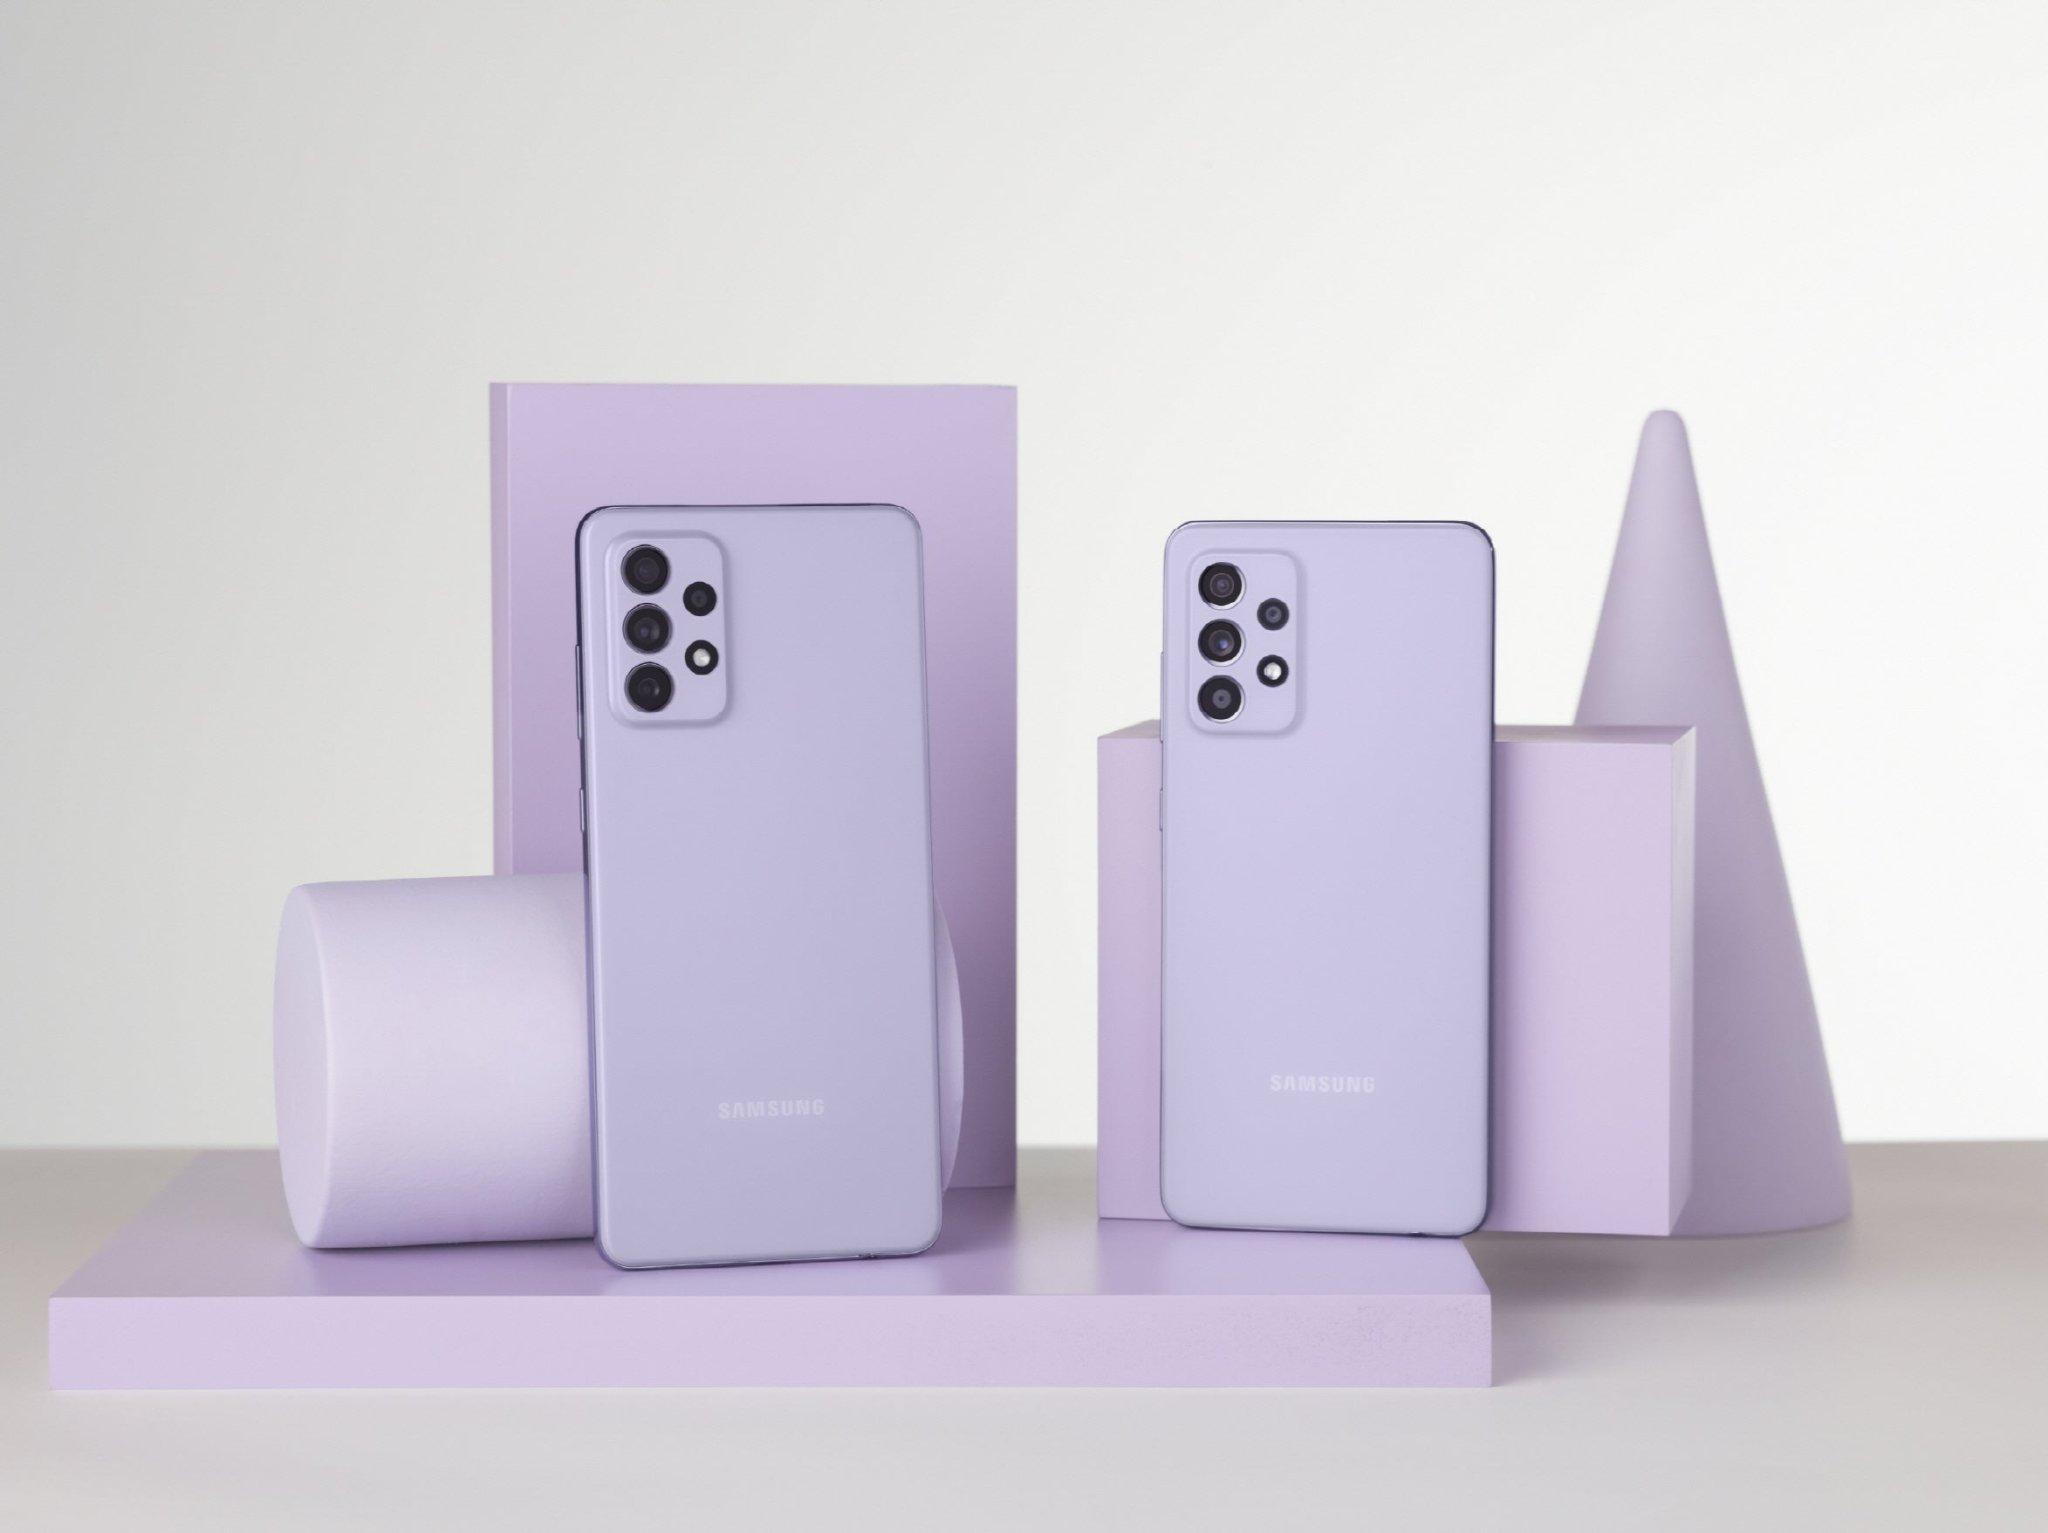 Samsung Unpacked: Meet the Galaxy A52 and A72